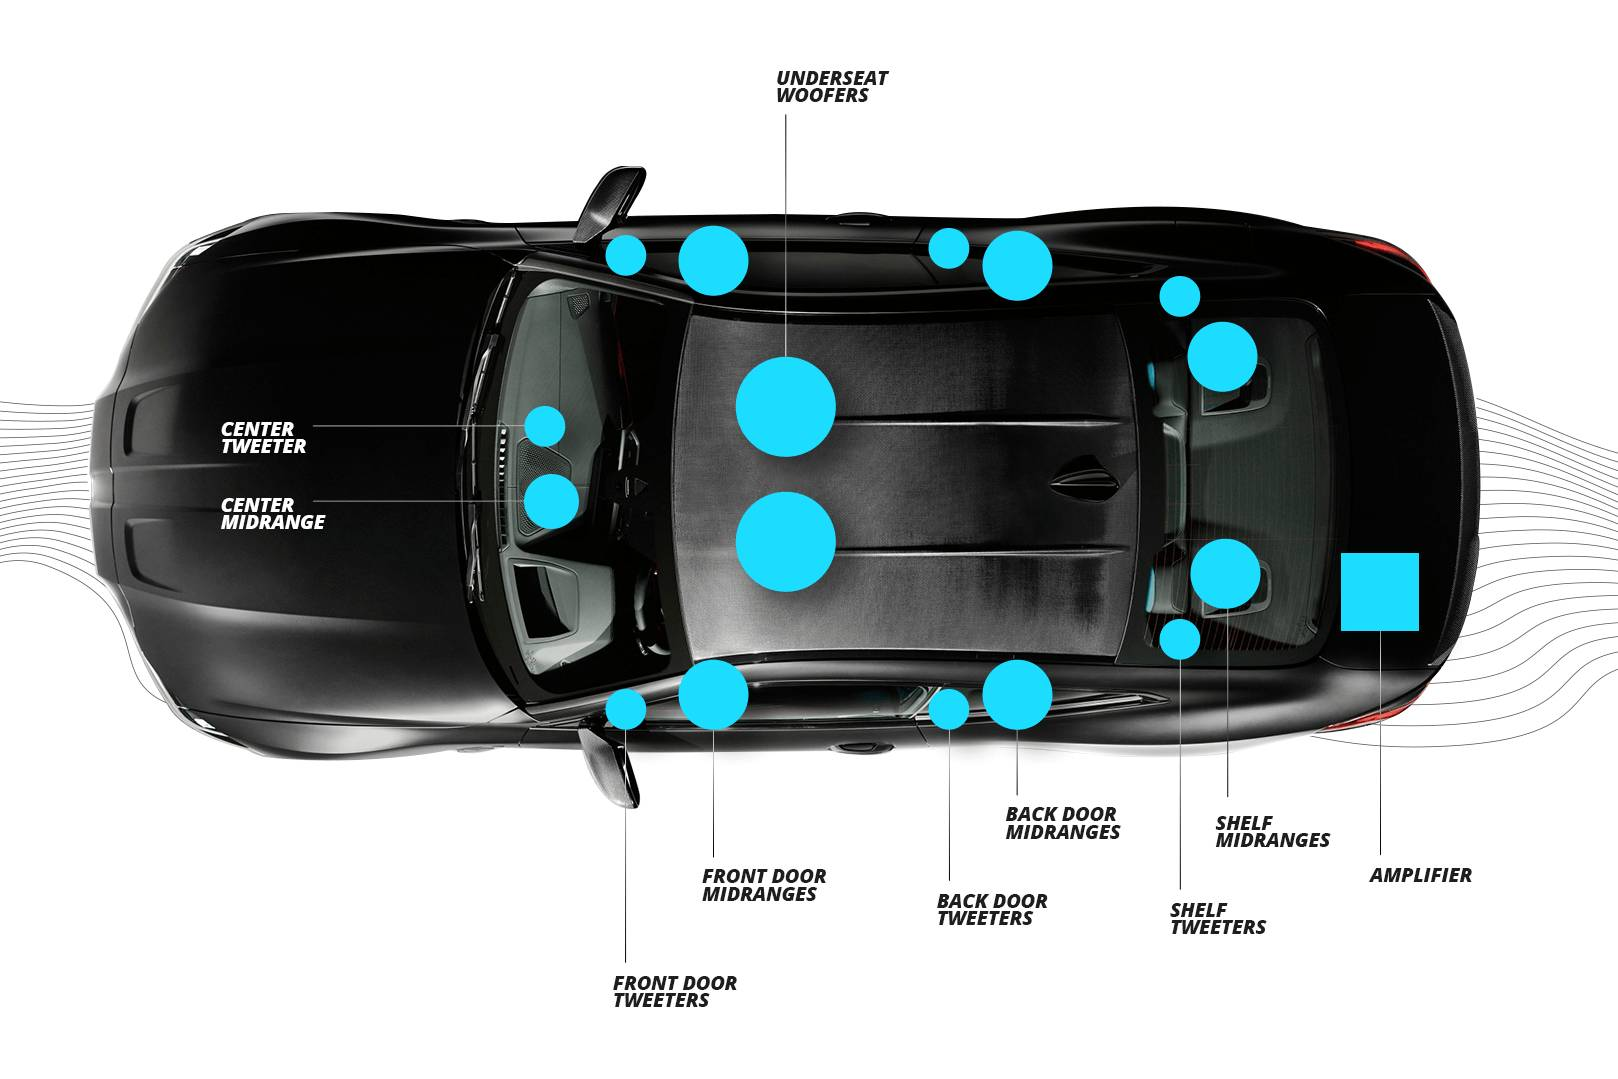 BMW Harman Kardon (Top-HiFi) sound system